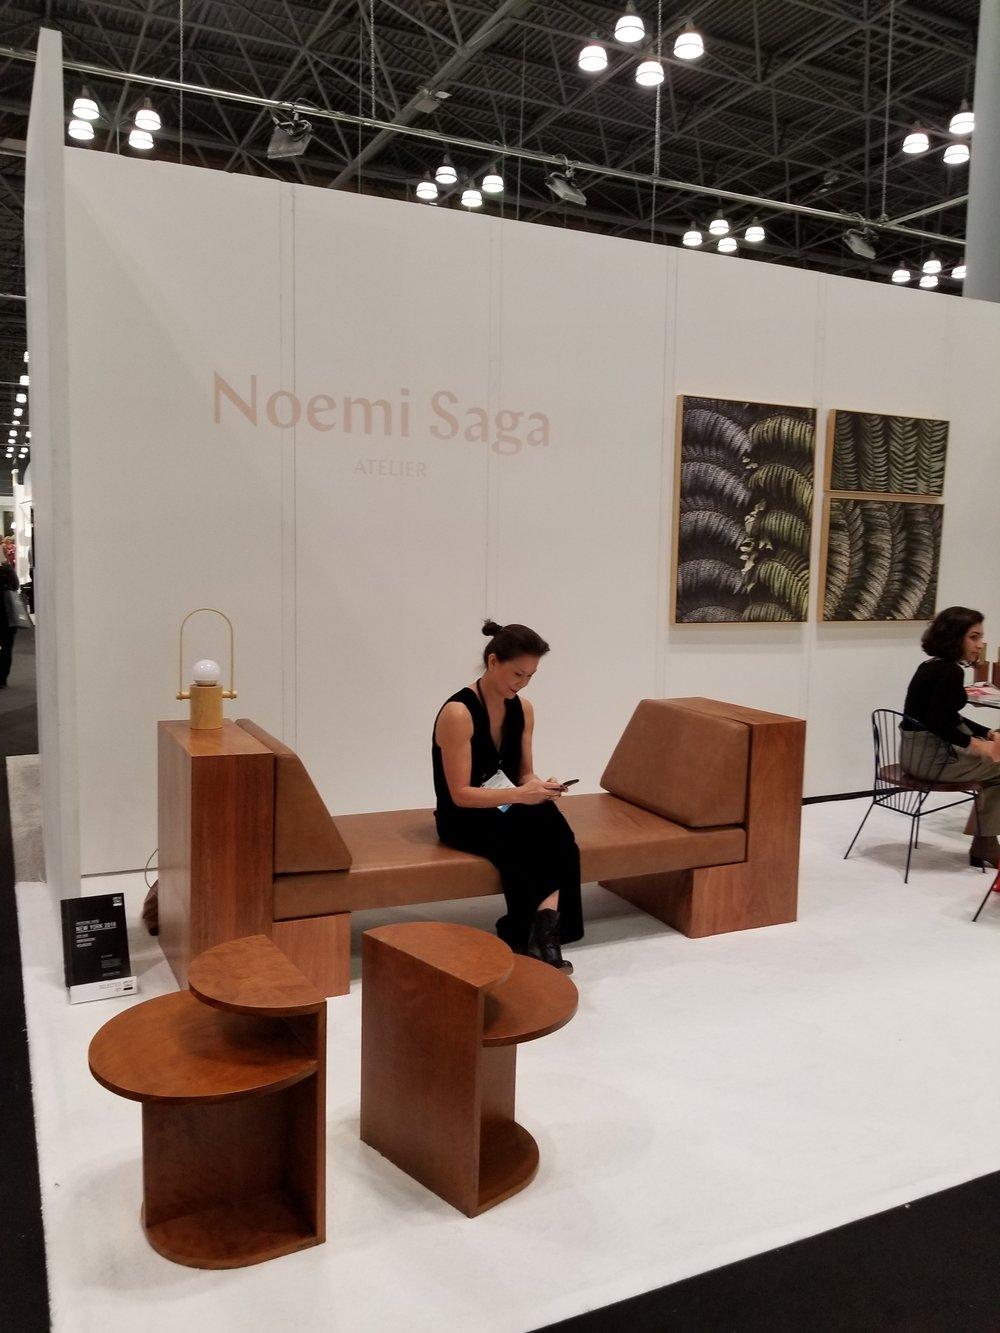 Noemi Saga